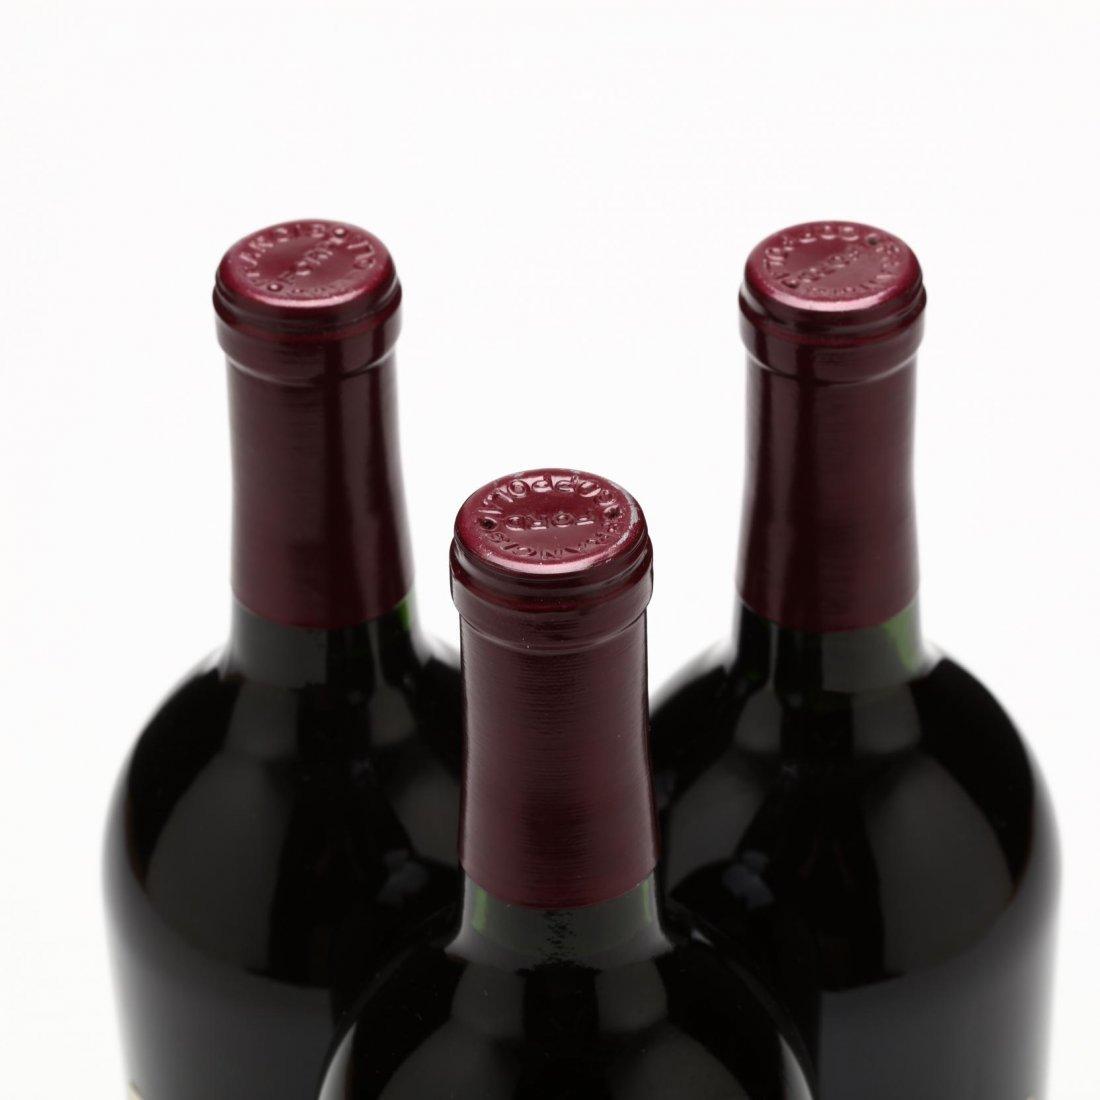 Niebaum-Coppola Winery - Vintage 1984 - 3